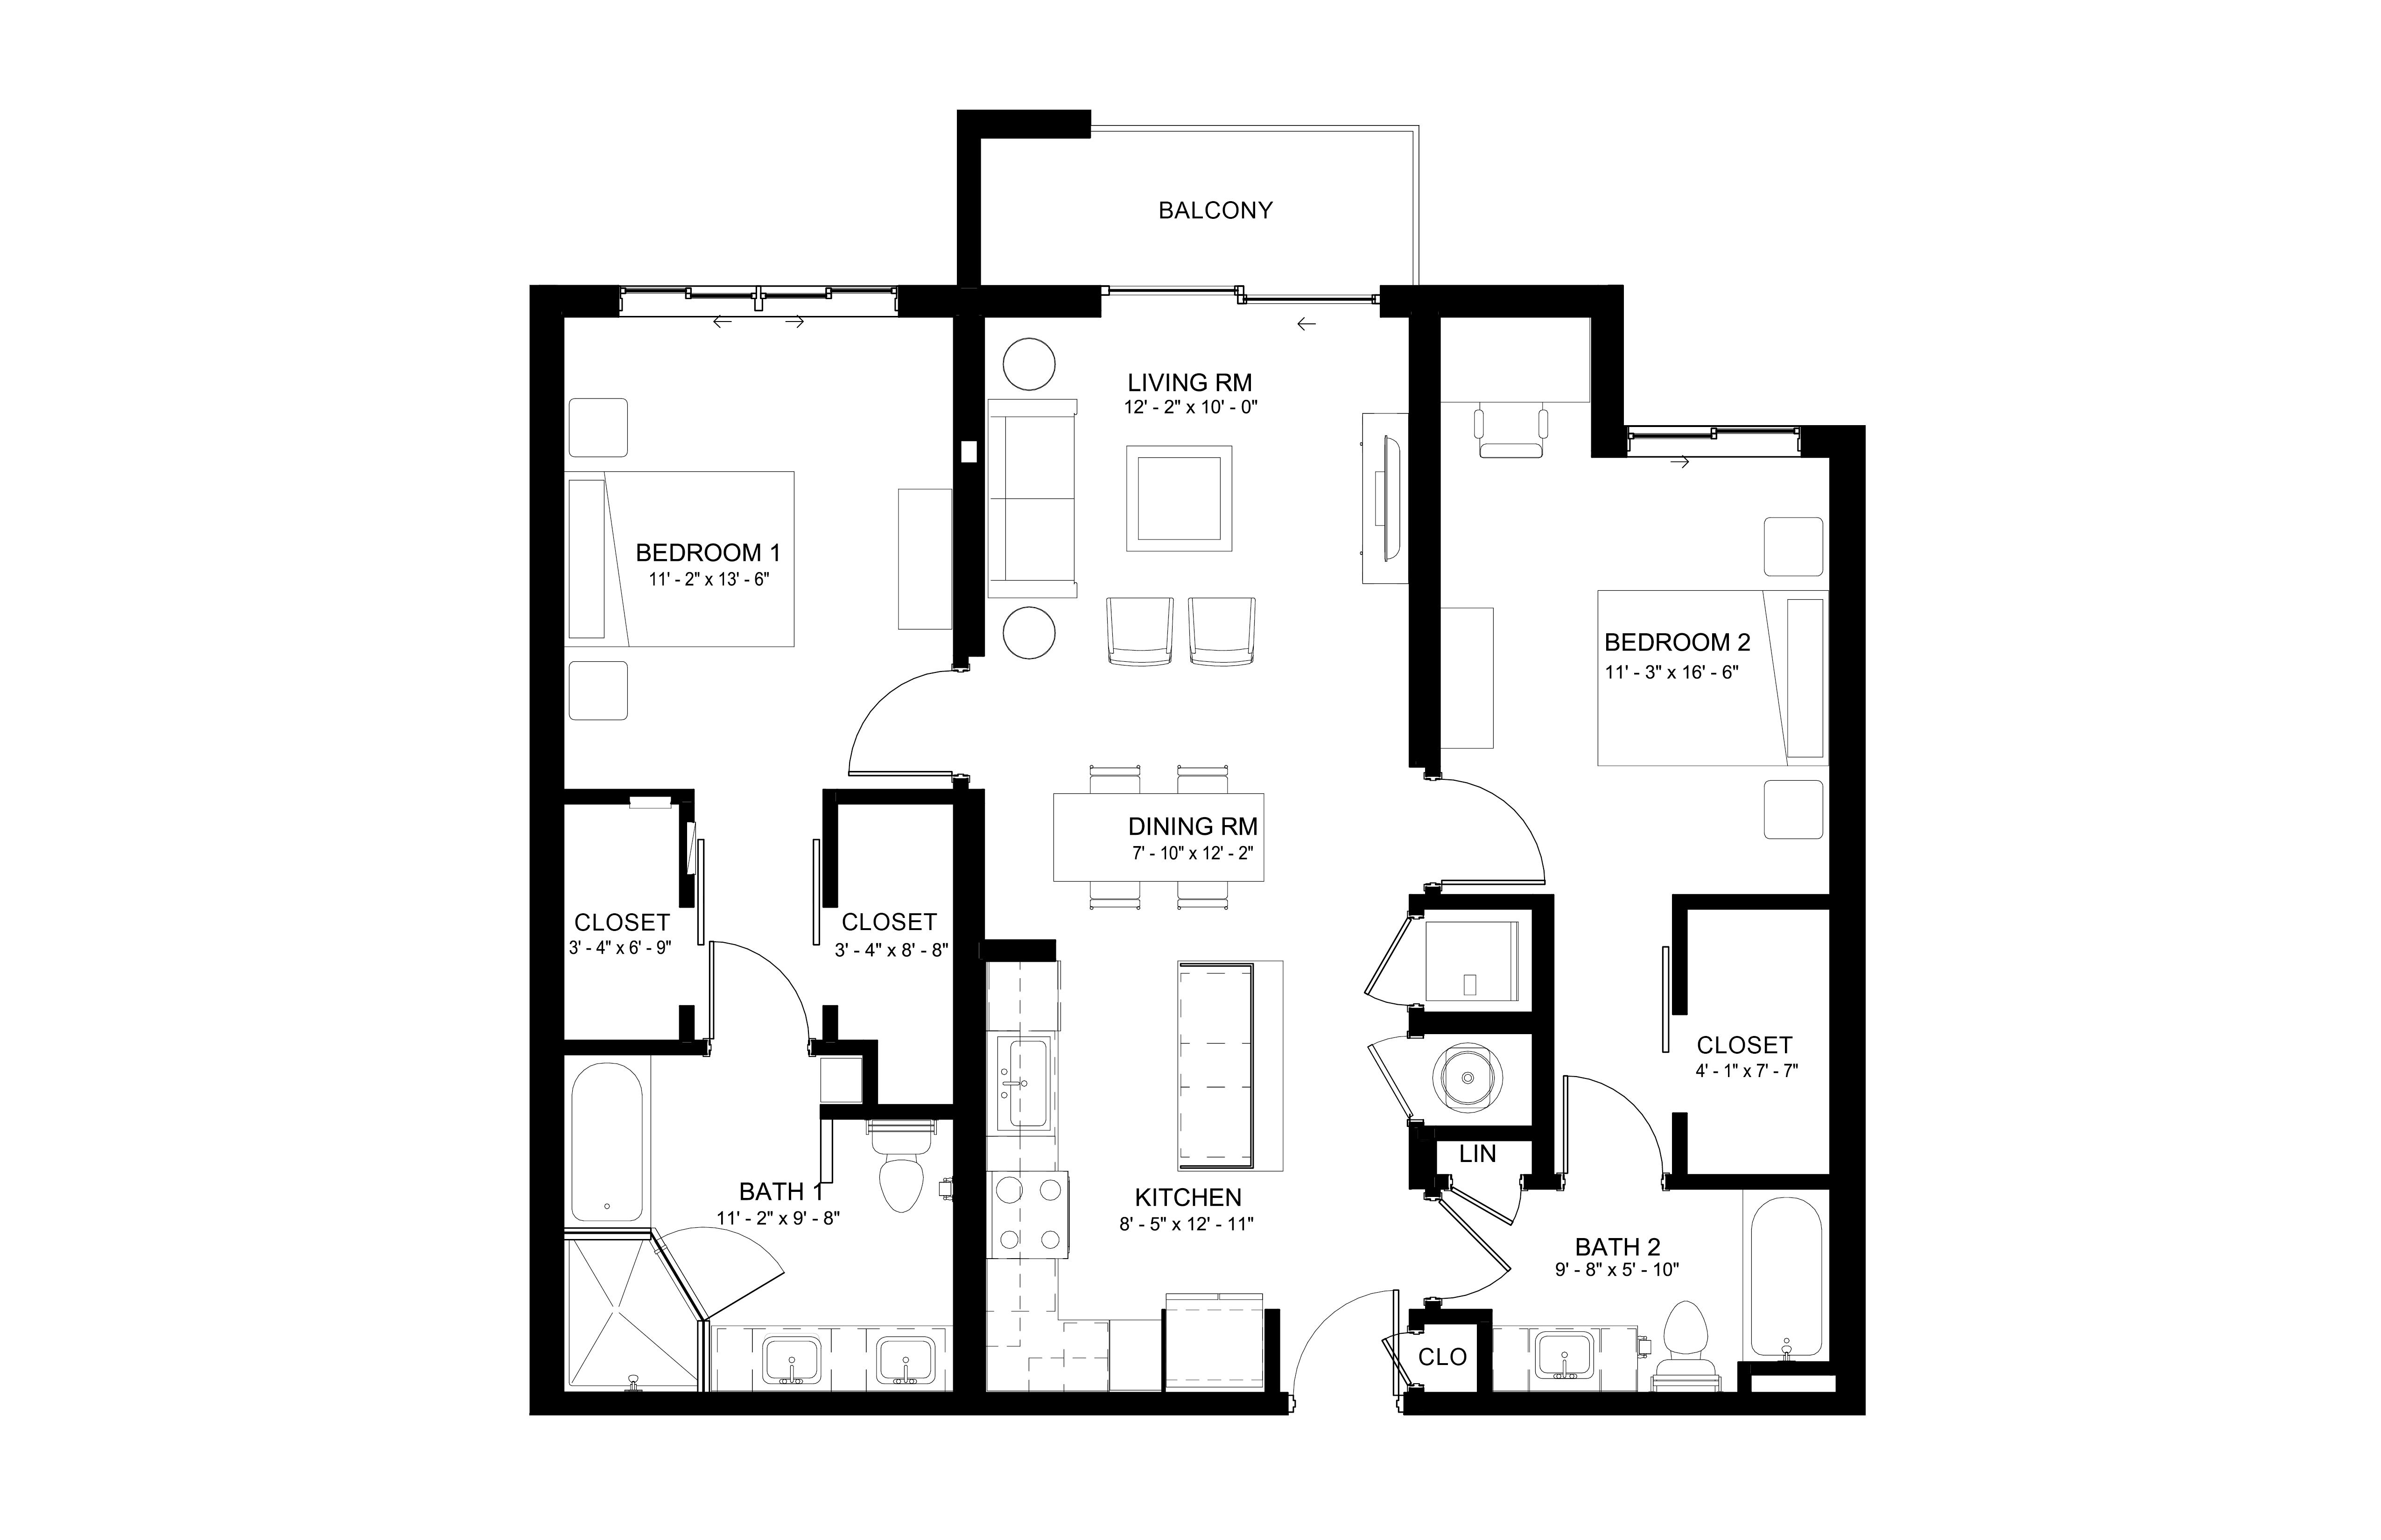 Apartment 630 floorplan